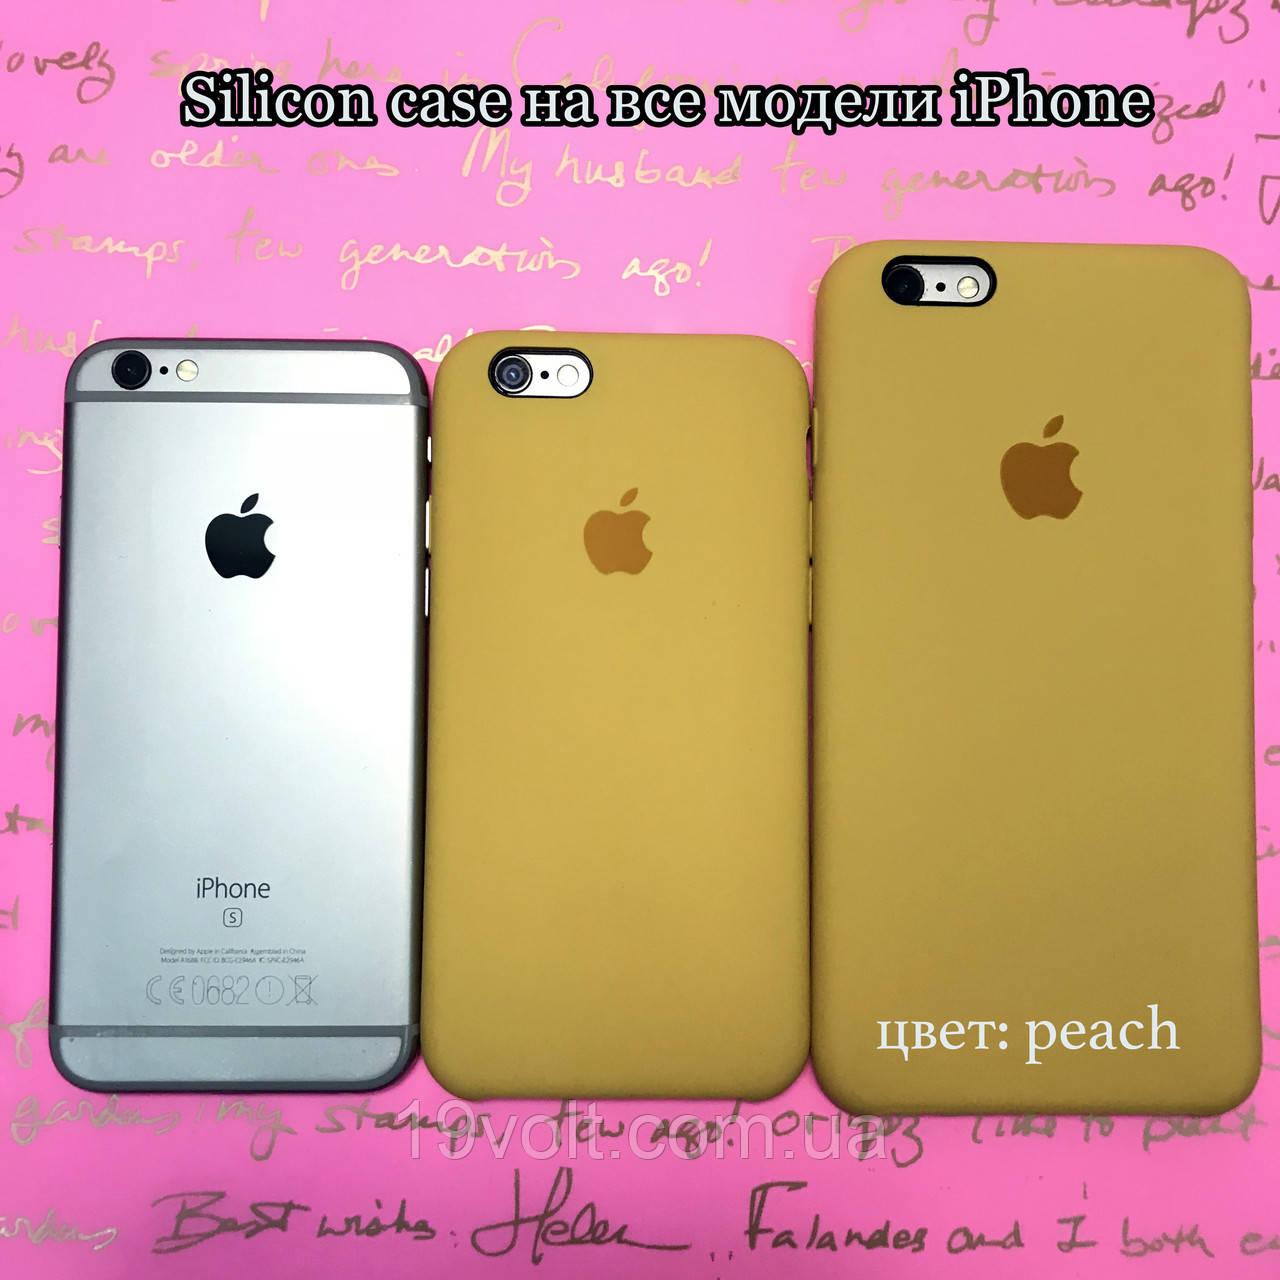 buy popular b31ff 3e1a4 Силиконовый чехол Apple Silicone Case iPhone 6, 6s; 7, 7 plus; 8, 8 plus;  (Peach): продажа, цена в Львове. ...